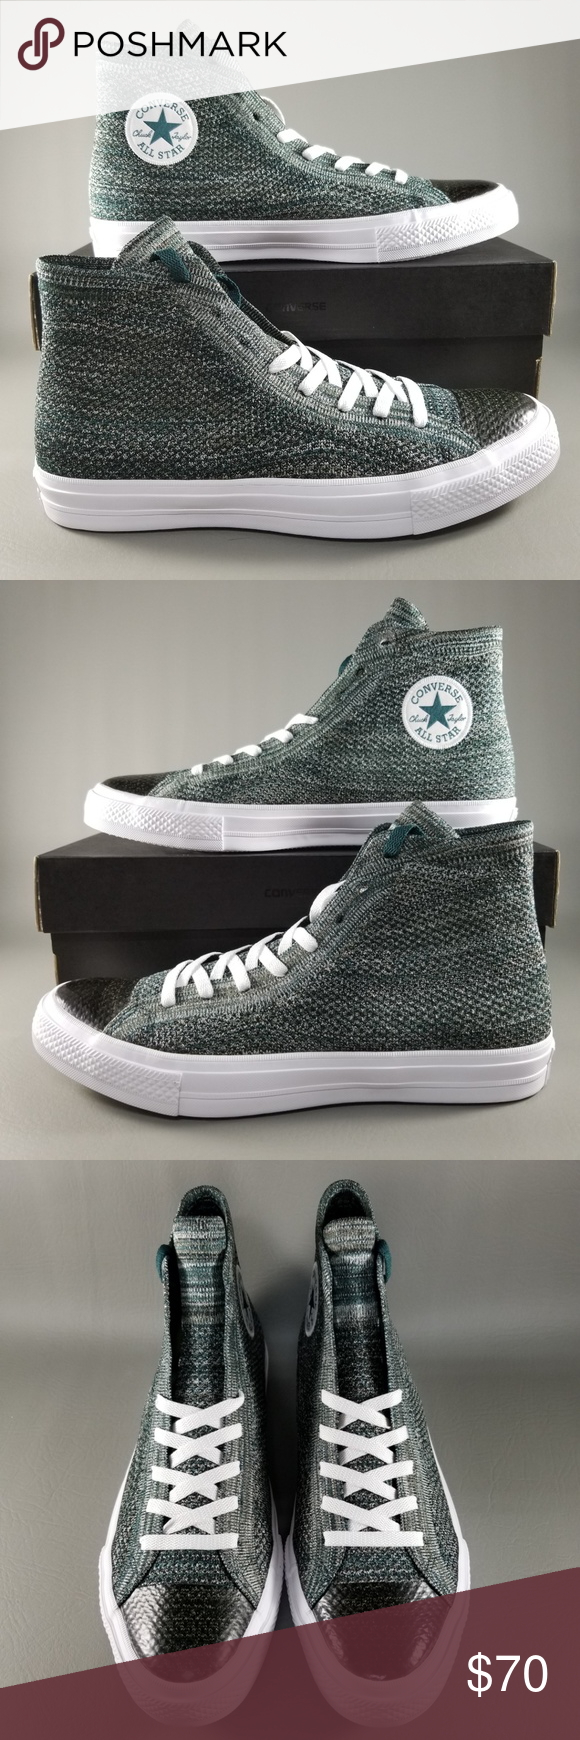 c4dbbbb73591 Converse CTAS X Nike Flyknit Mens Shoe SZ 10 Green Converse Chuck Taylor  All Star X